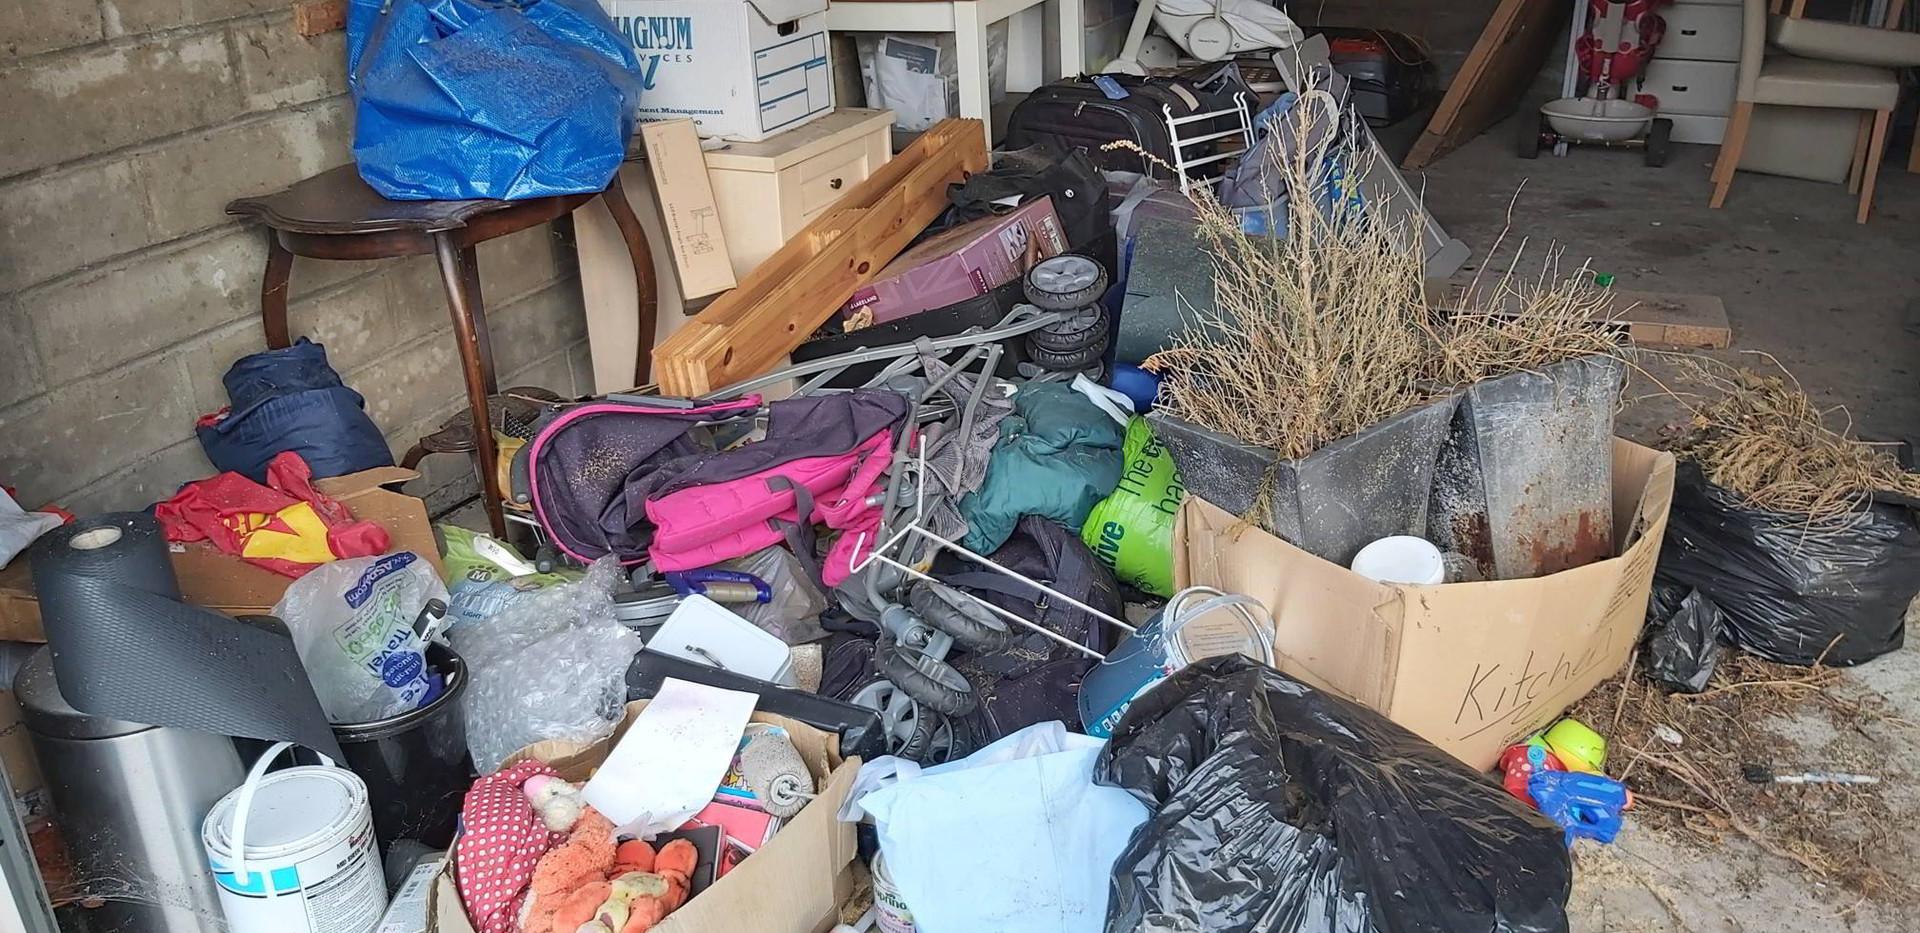 Garage Rubbish removal